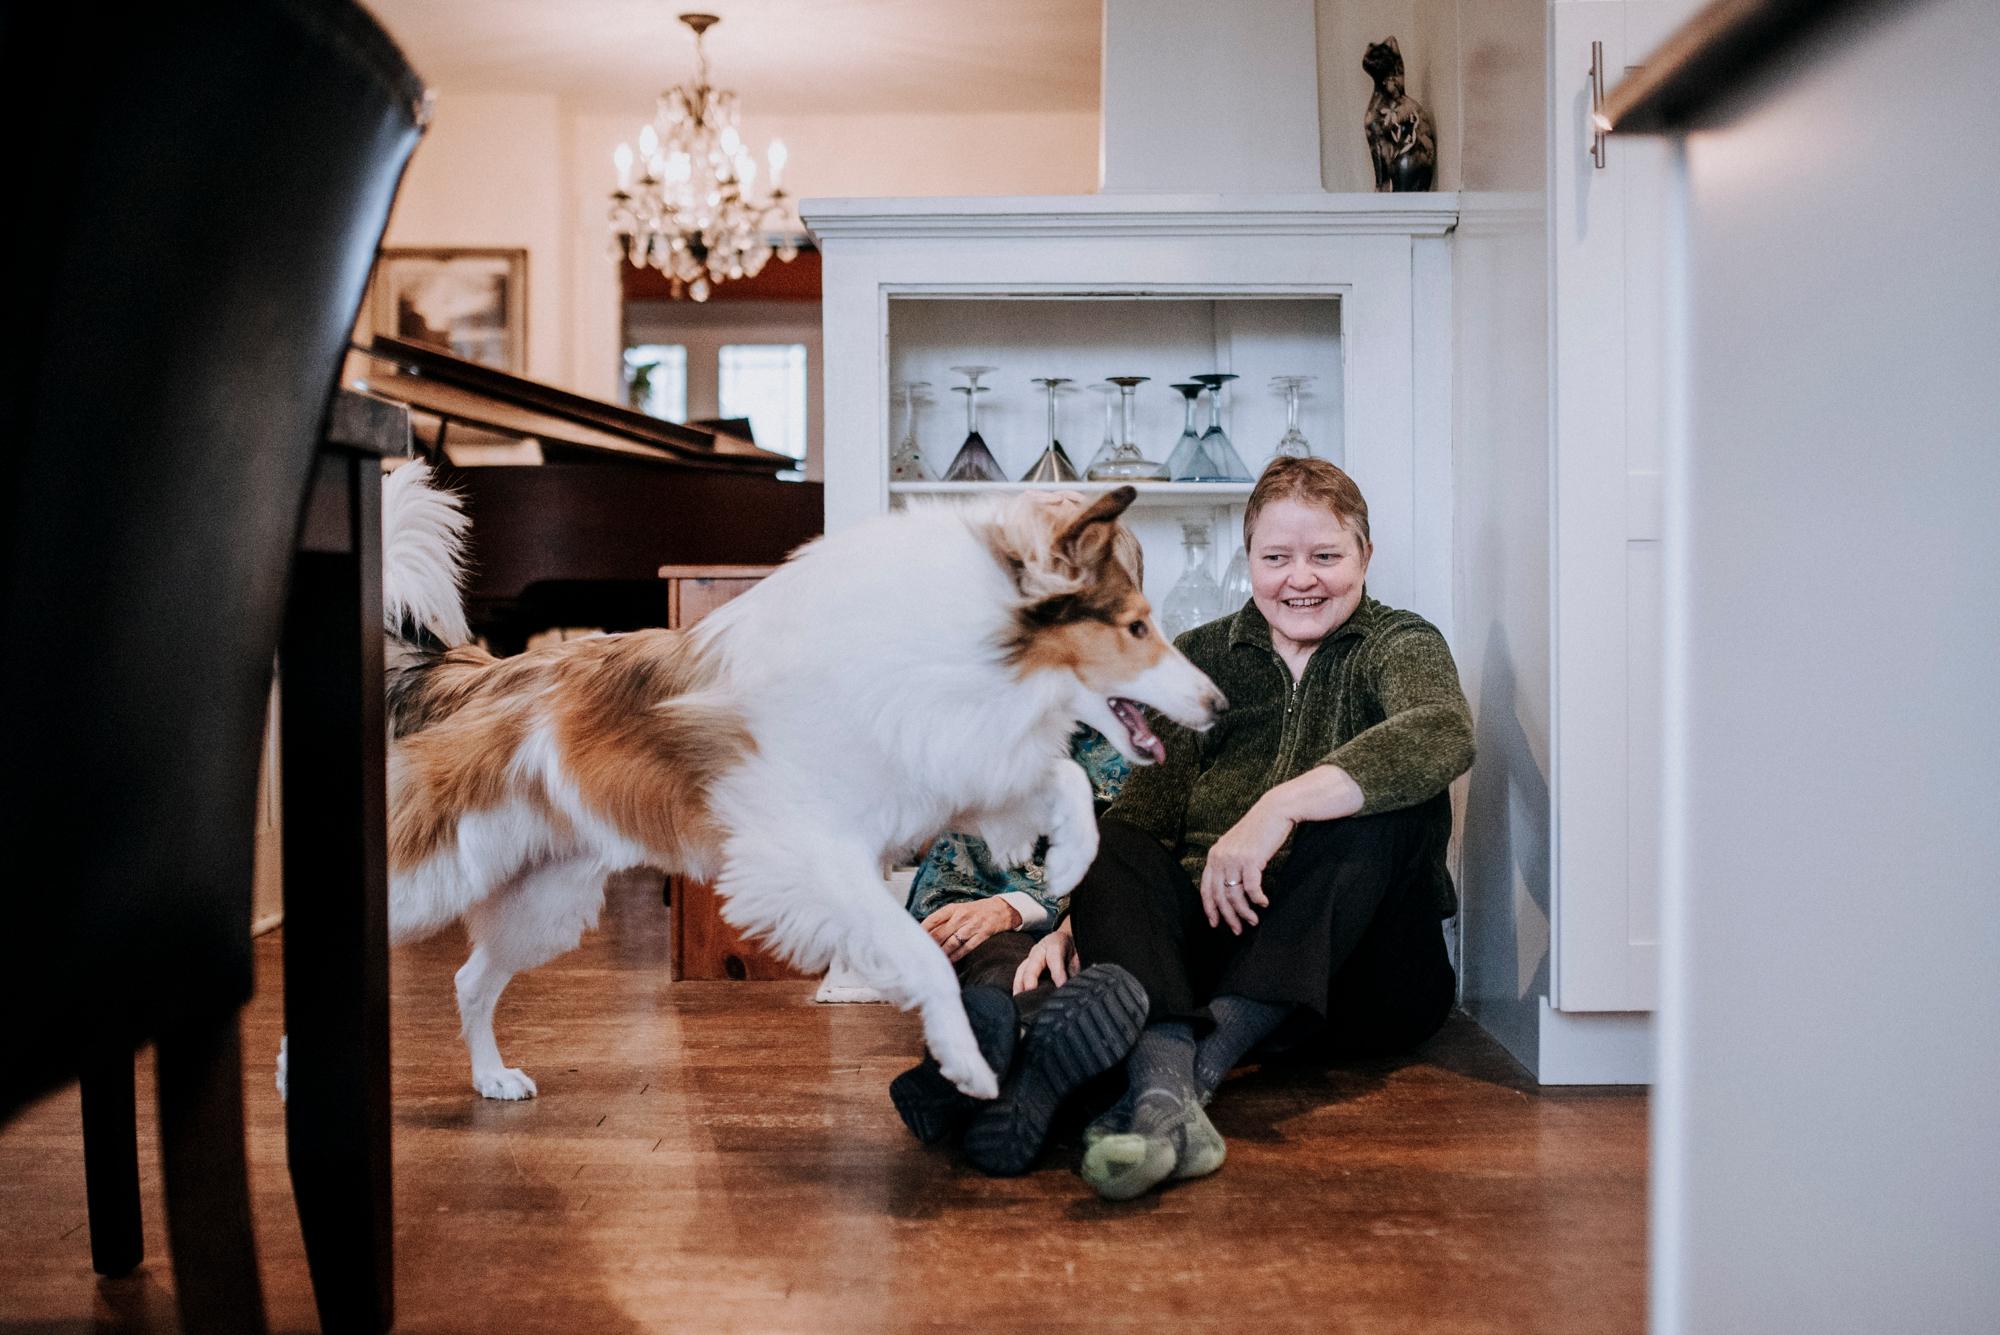 201-Vicky+Sheri-_Pittsburgh-family-photographer.jpg